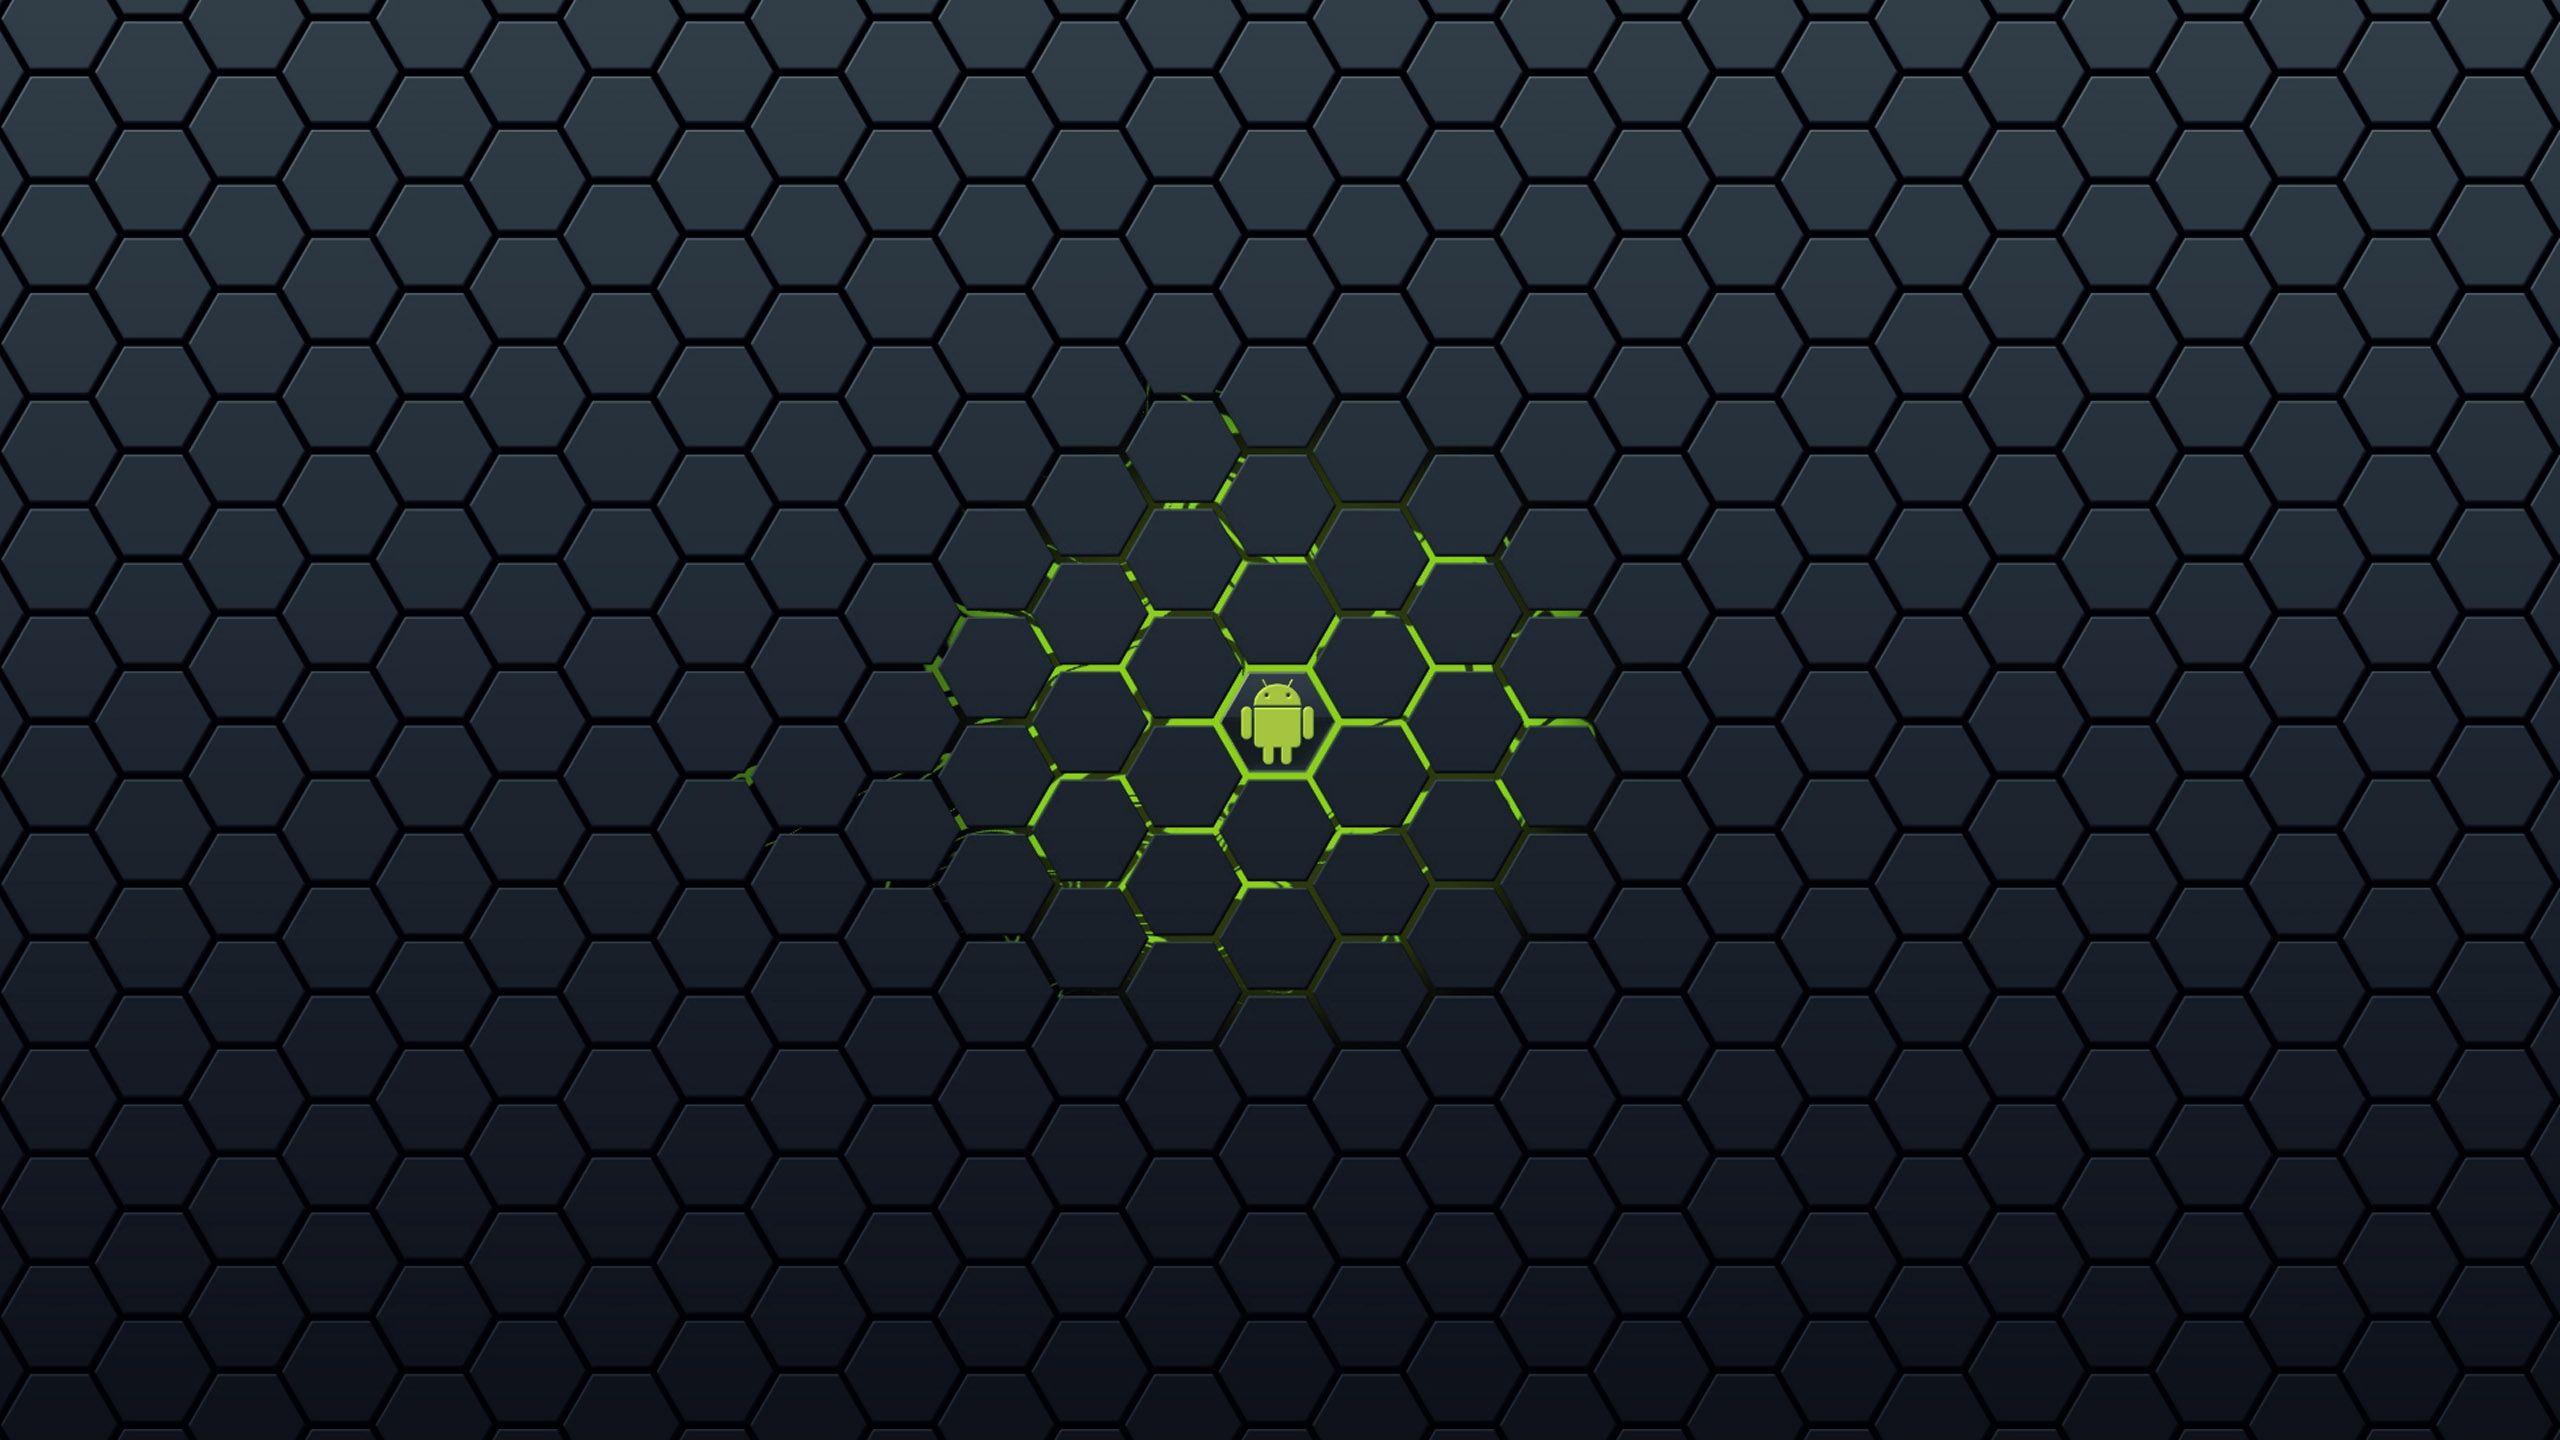 3d Android Wallpaper Hd Wallpapers For Android Jpg 2560 1440 Seni Grafis Seni Grafis